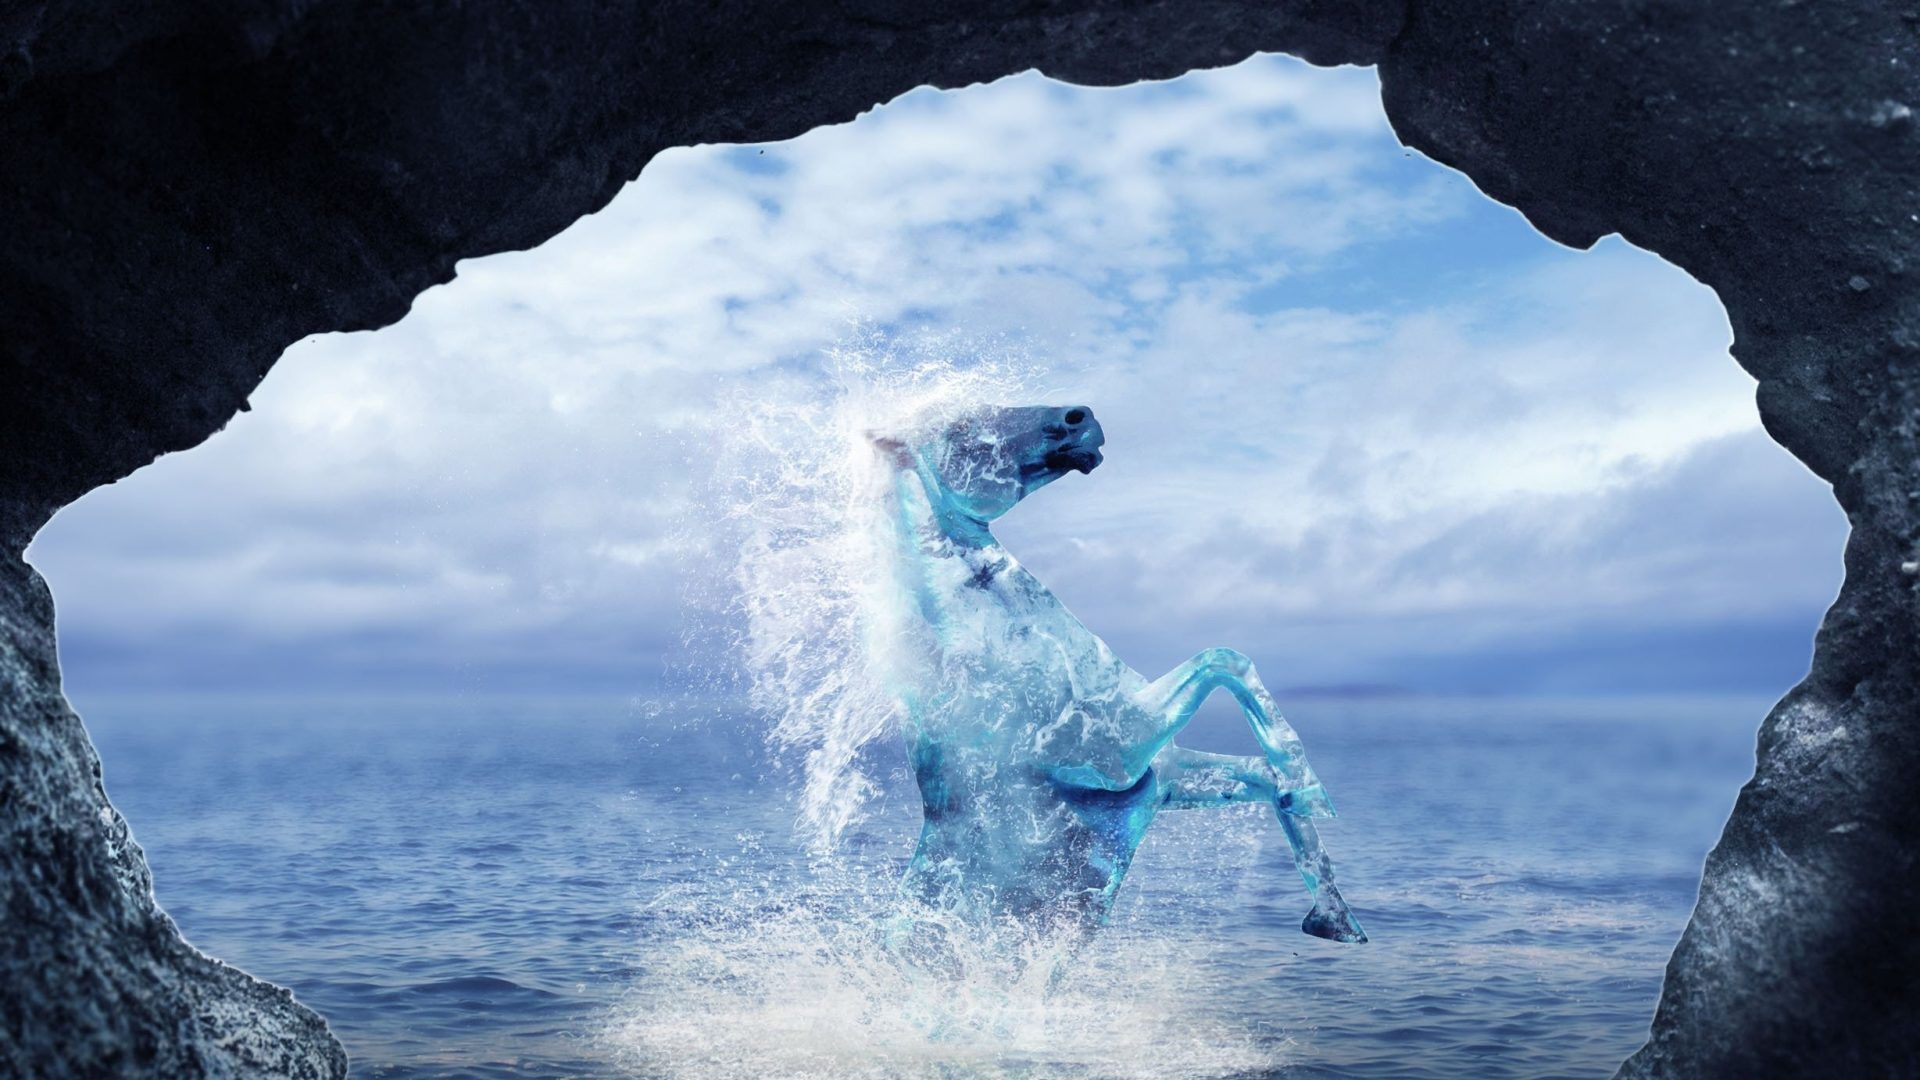 Most Inspiring Wallpaper Horse Ocean - c58932ac0c12ac990aaedb7a4a358570  Picture_92773.jpg